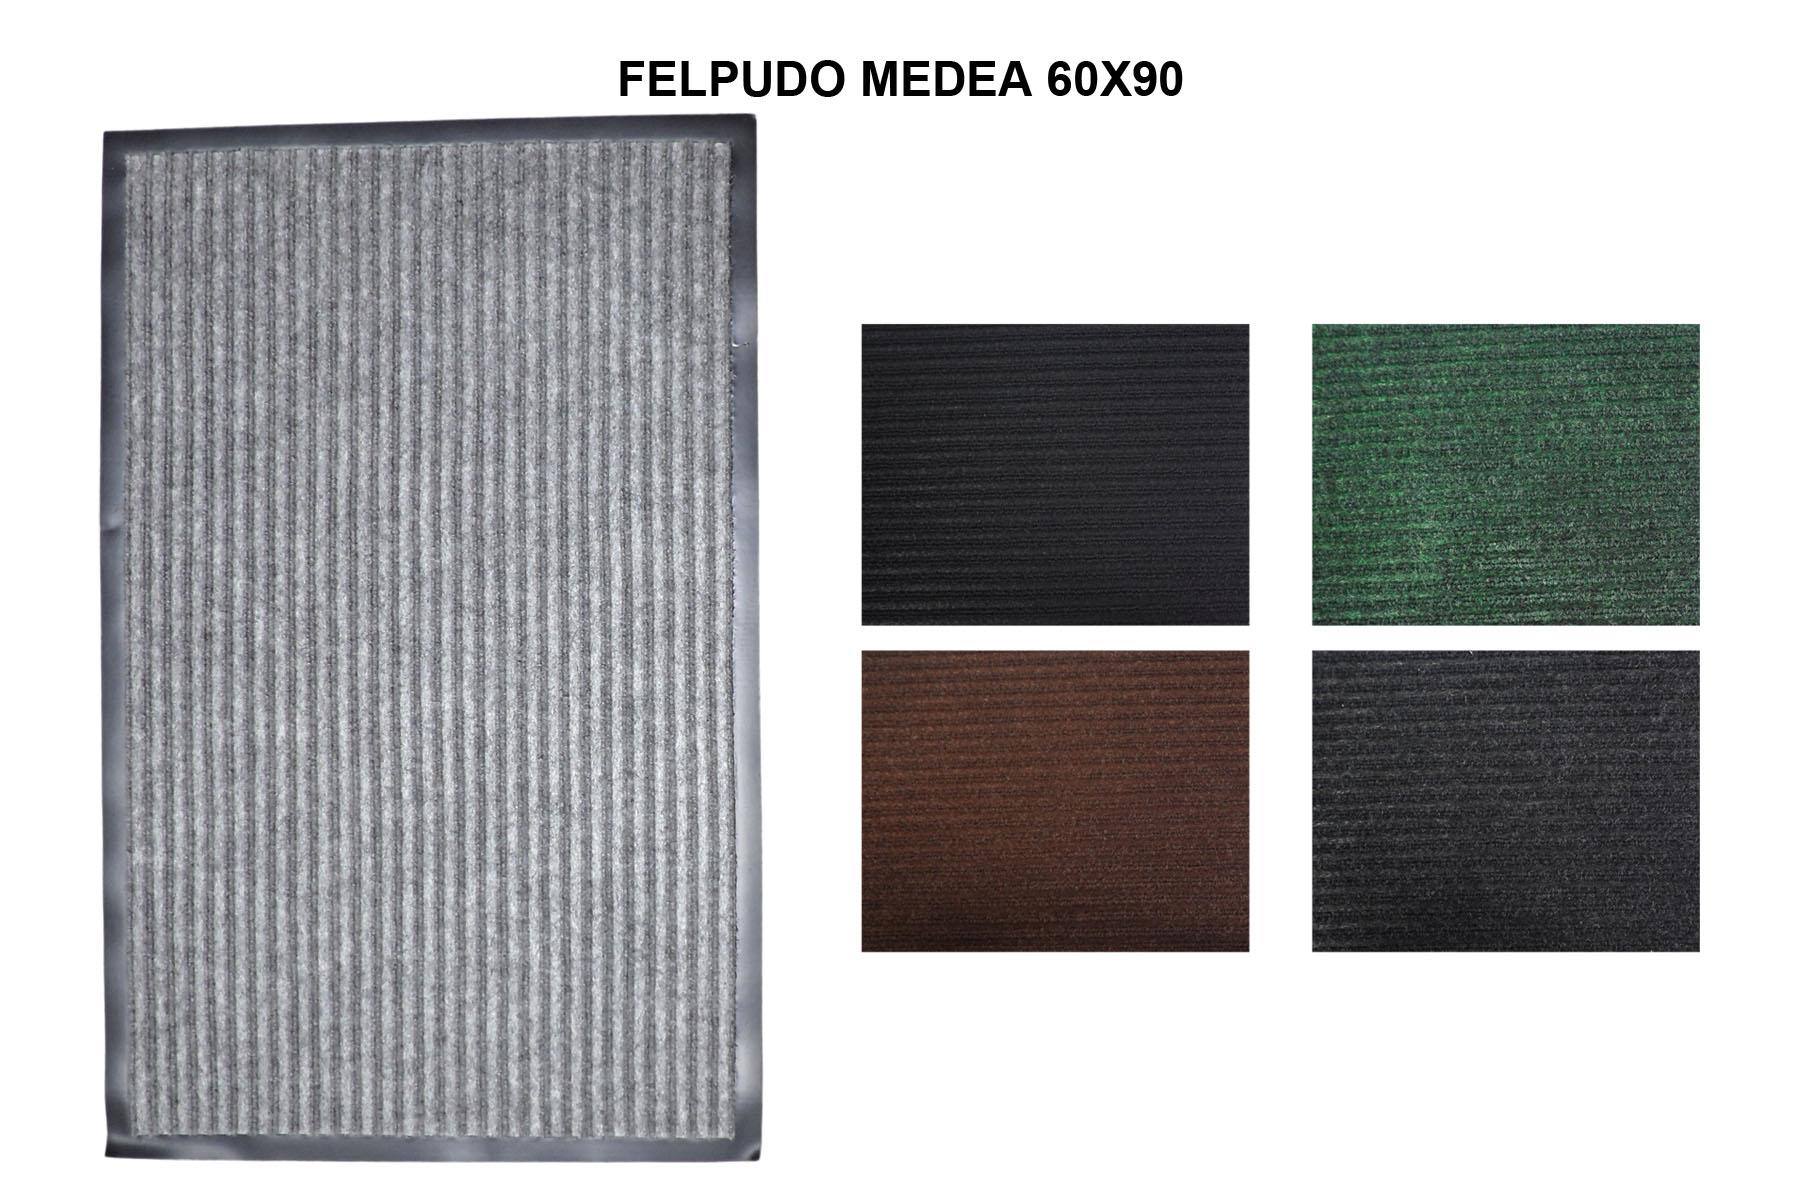 FELPUDO MEDEA 60X90